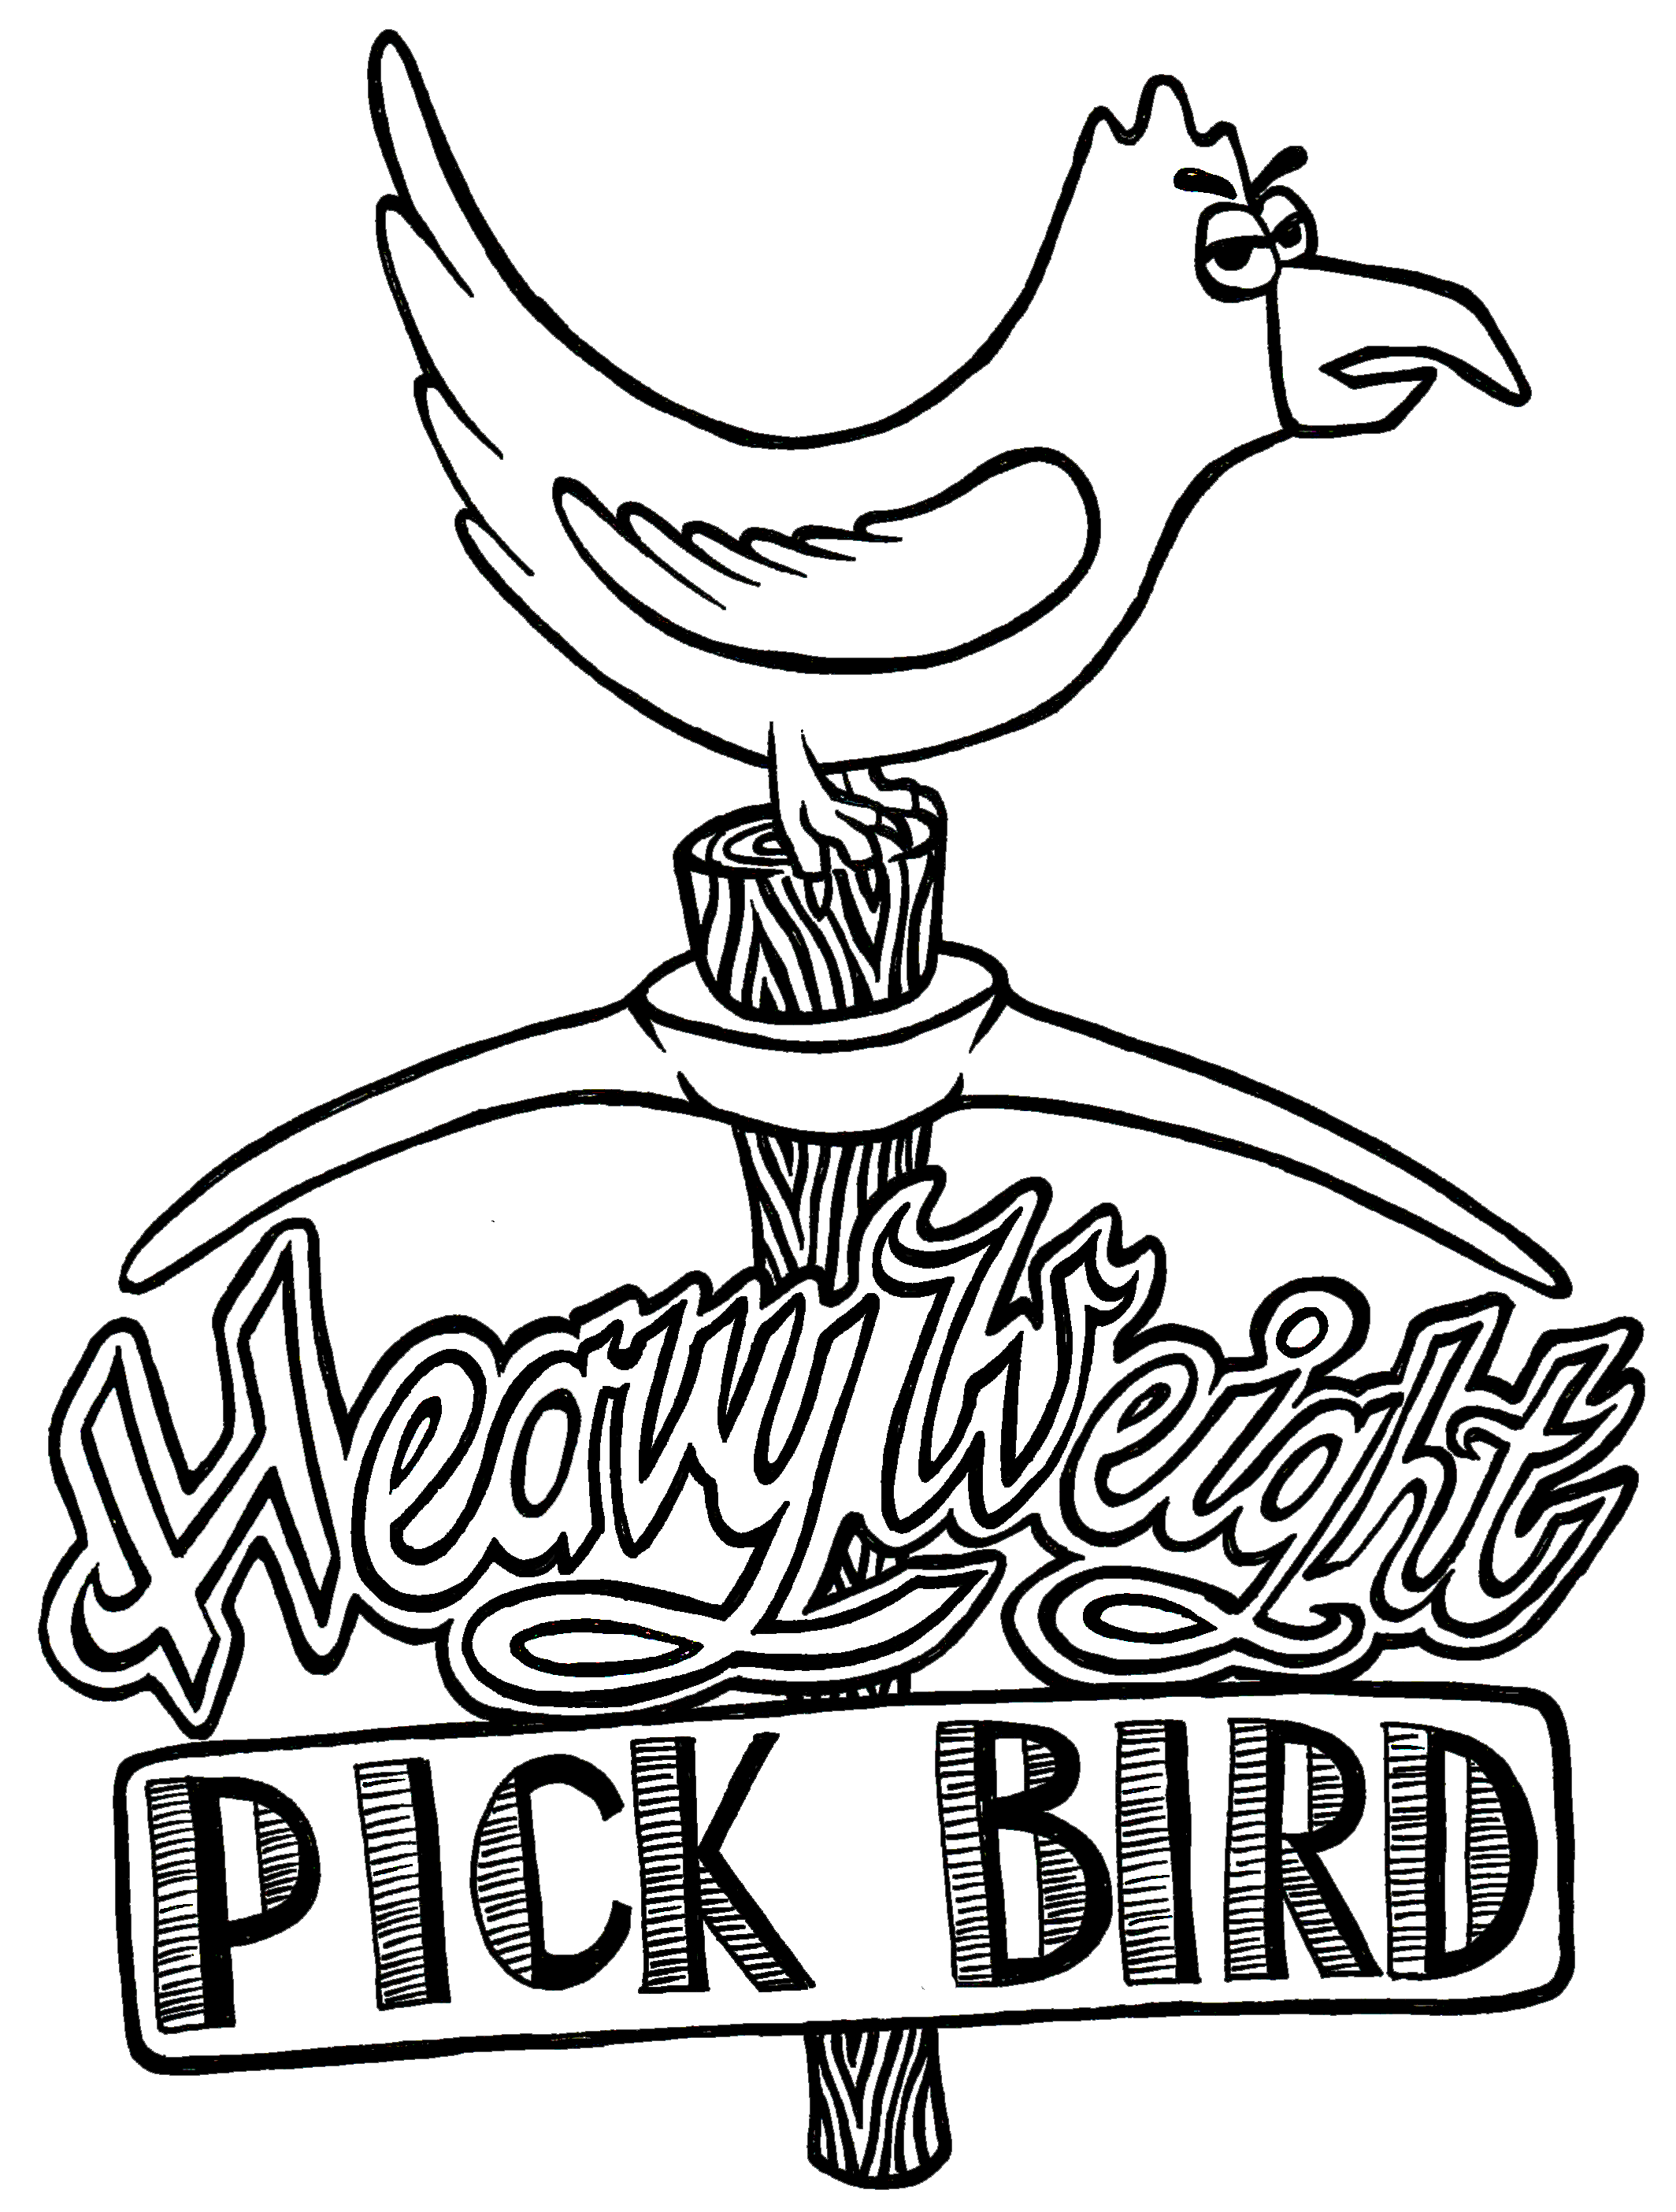 Heavyweight Pick Bird (2013)